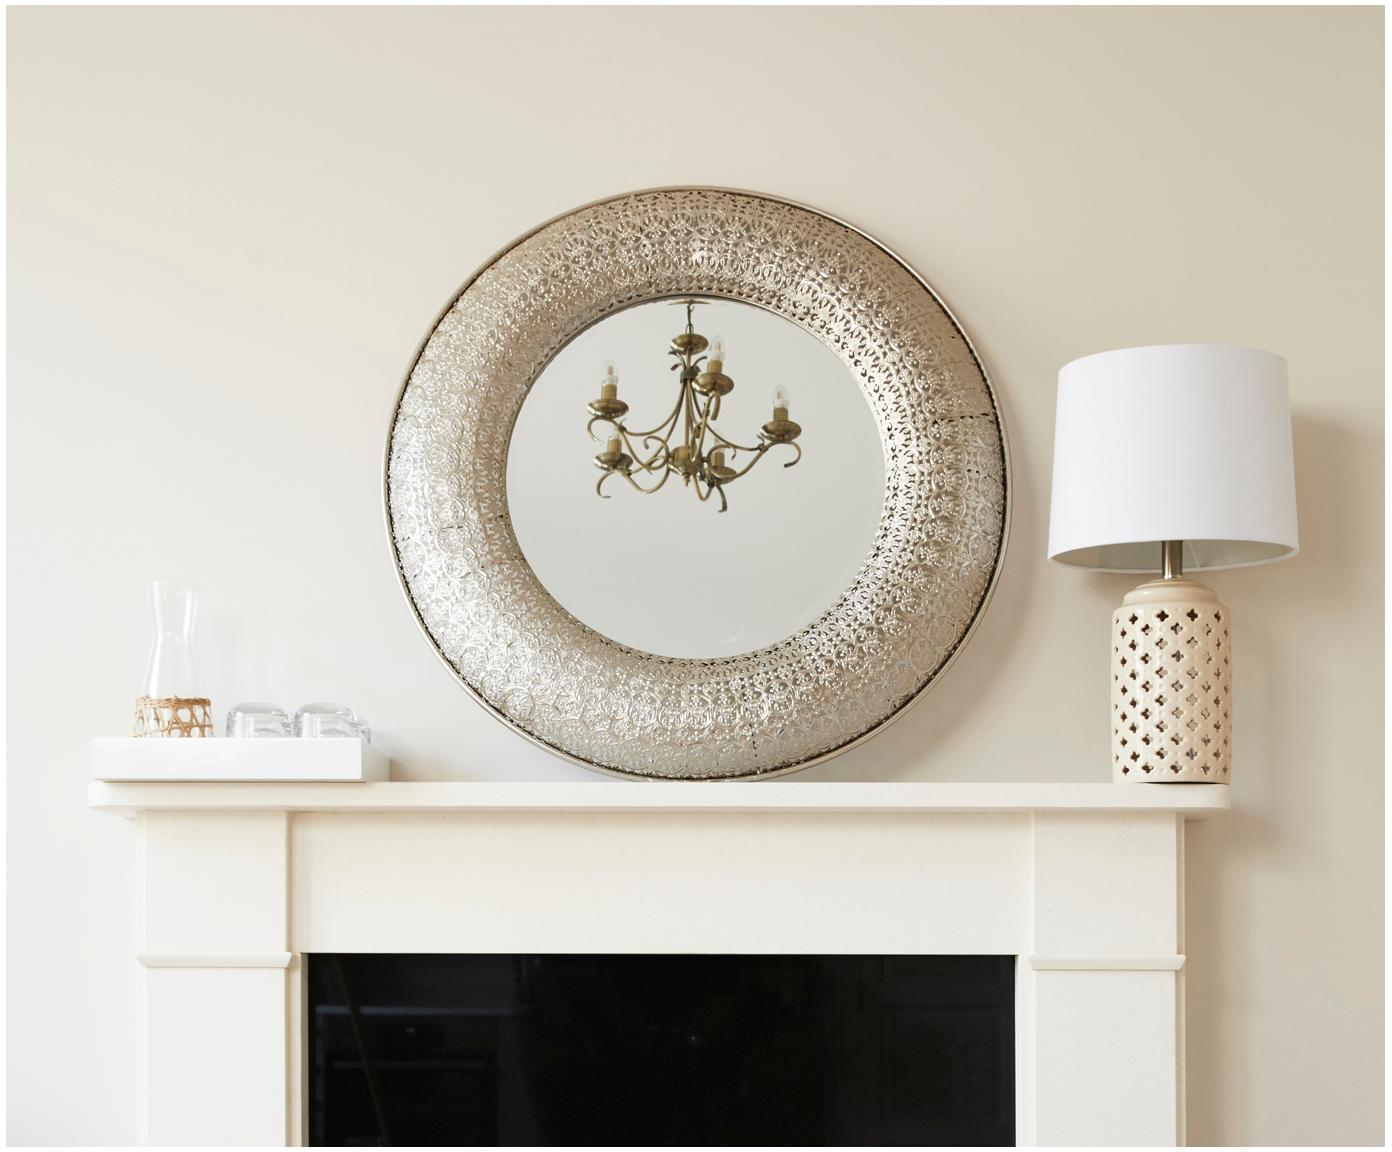 Handgefertigte Karaffe Wicker mit dekorativem Weidengeflecht, Transparent, Hellbraun, 1 L